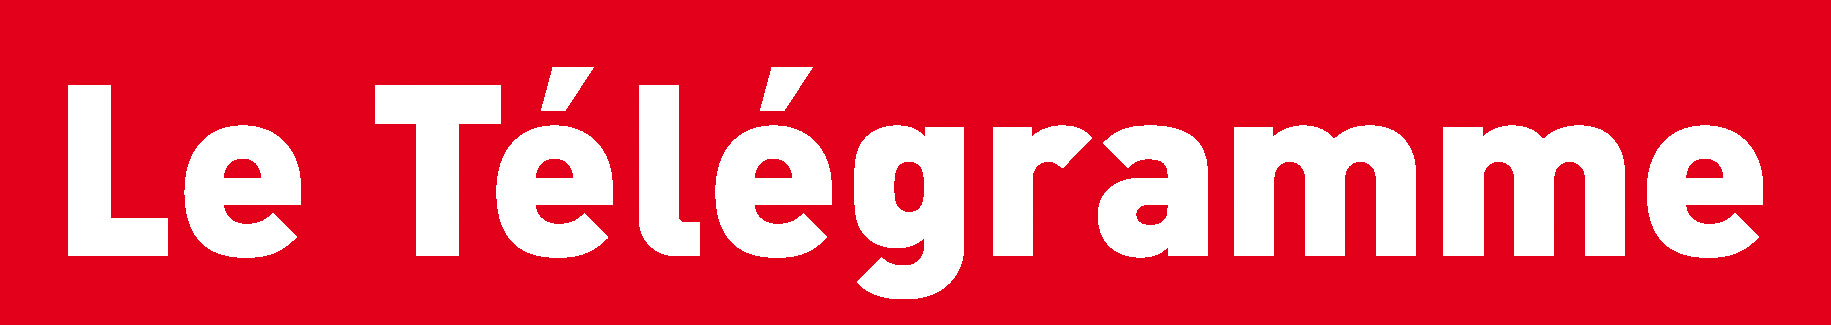 logo_le_telegramme_2021